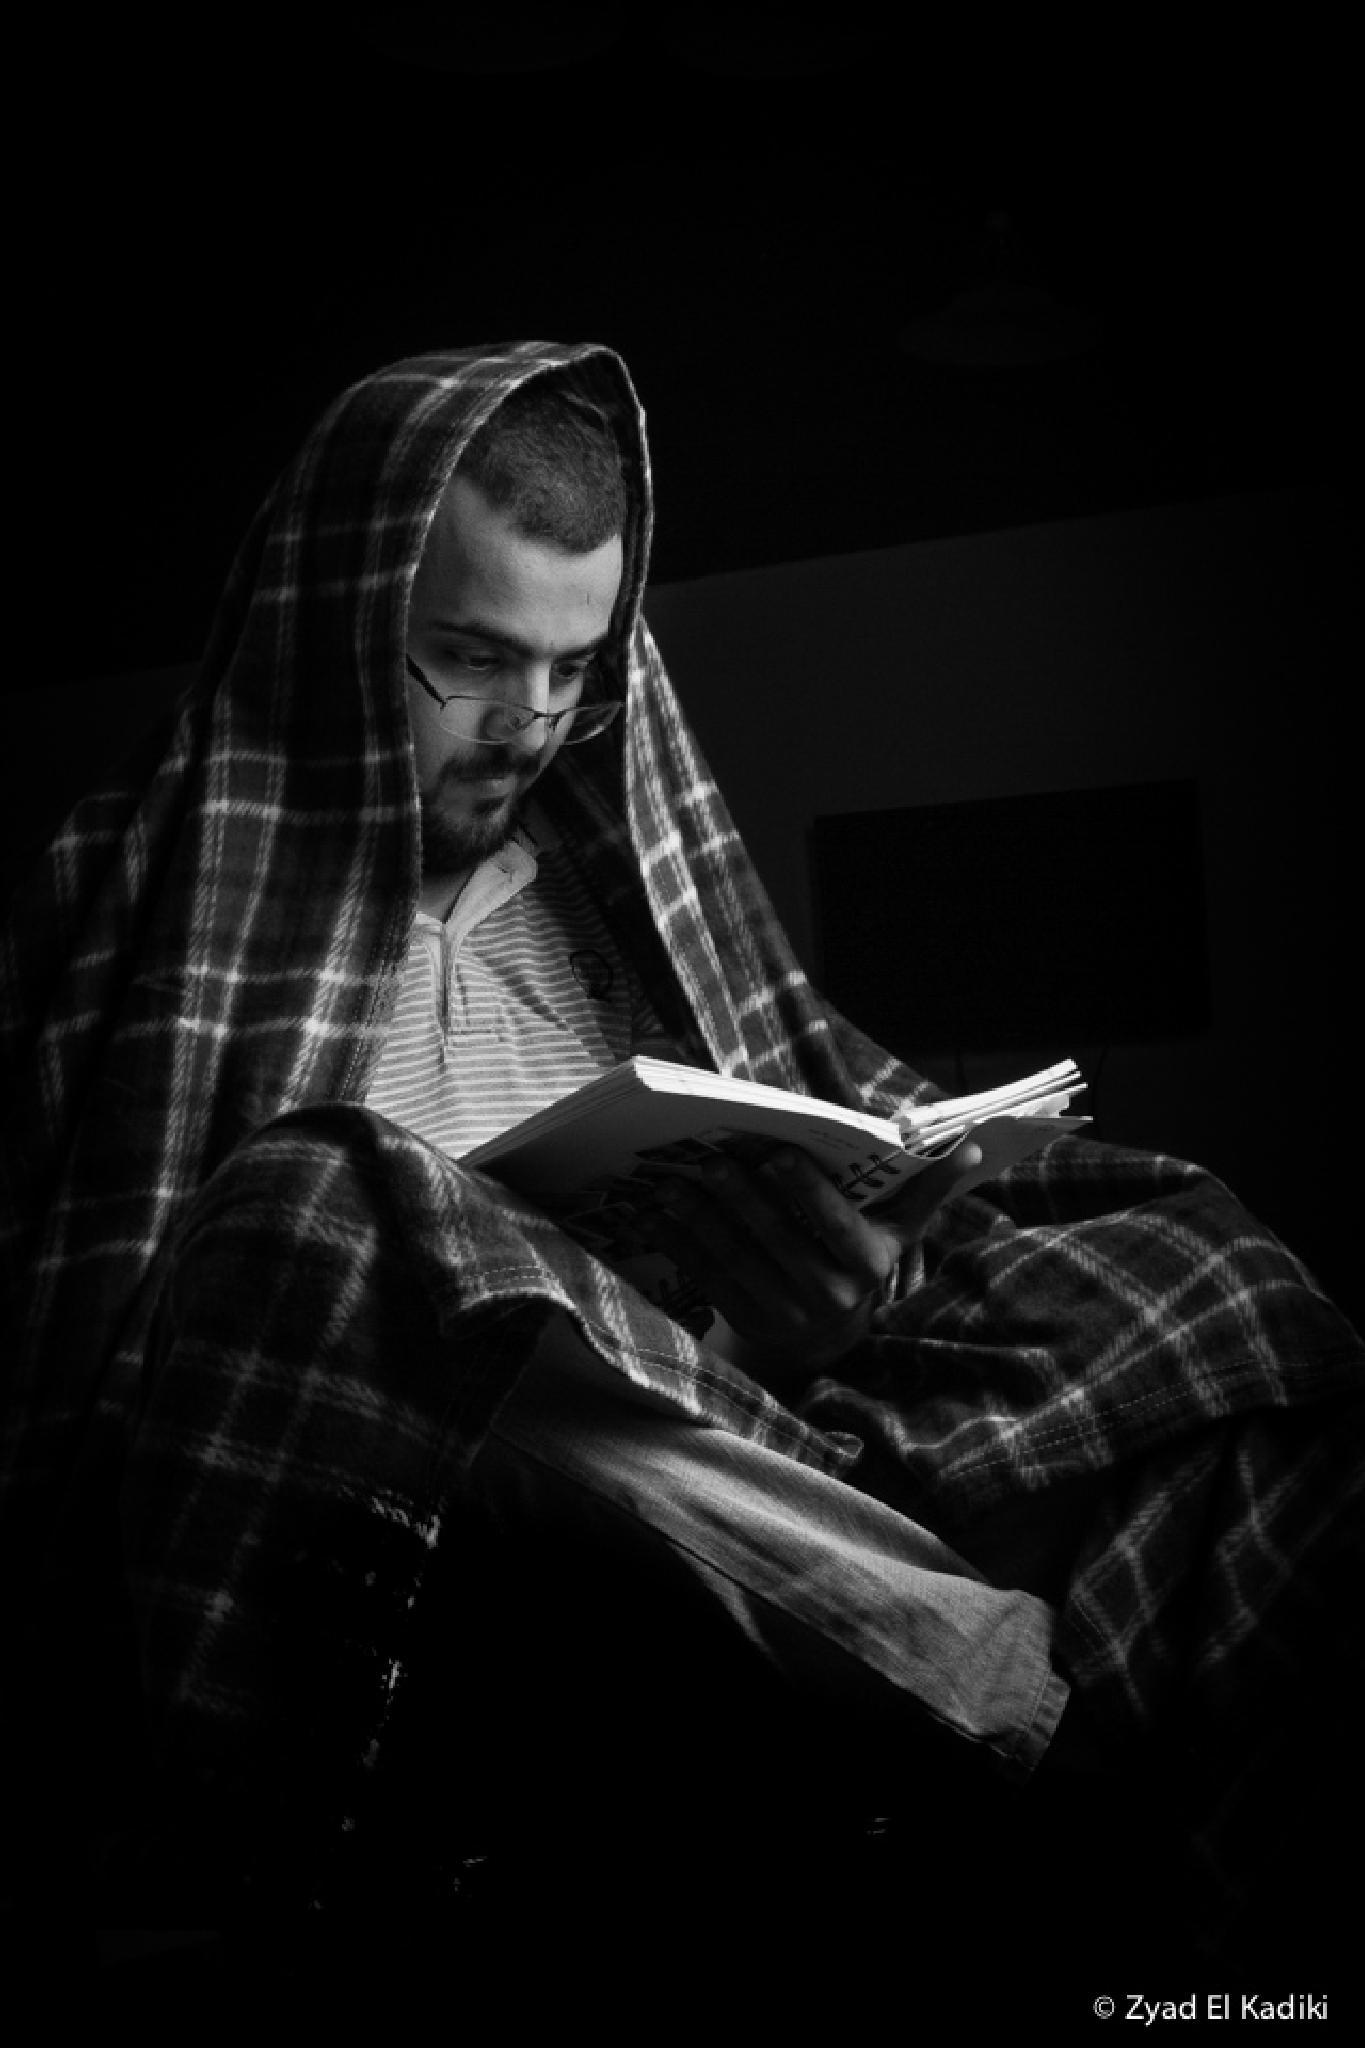 Book .. Best Friend. by Zyad M. Elkadiki